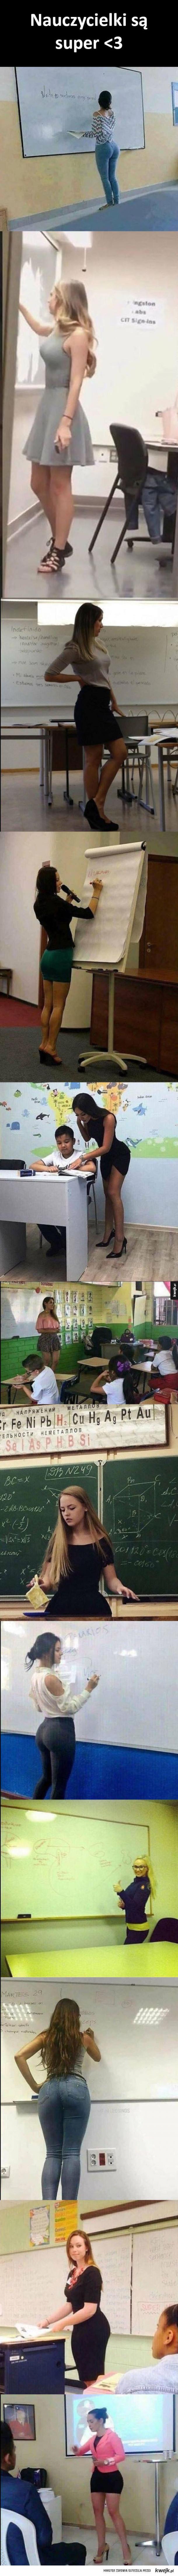 nauczycielki